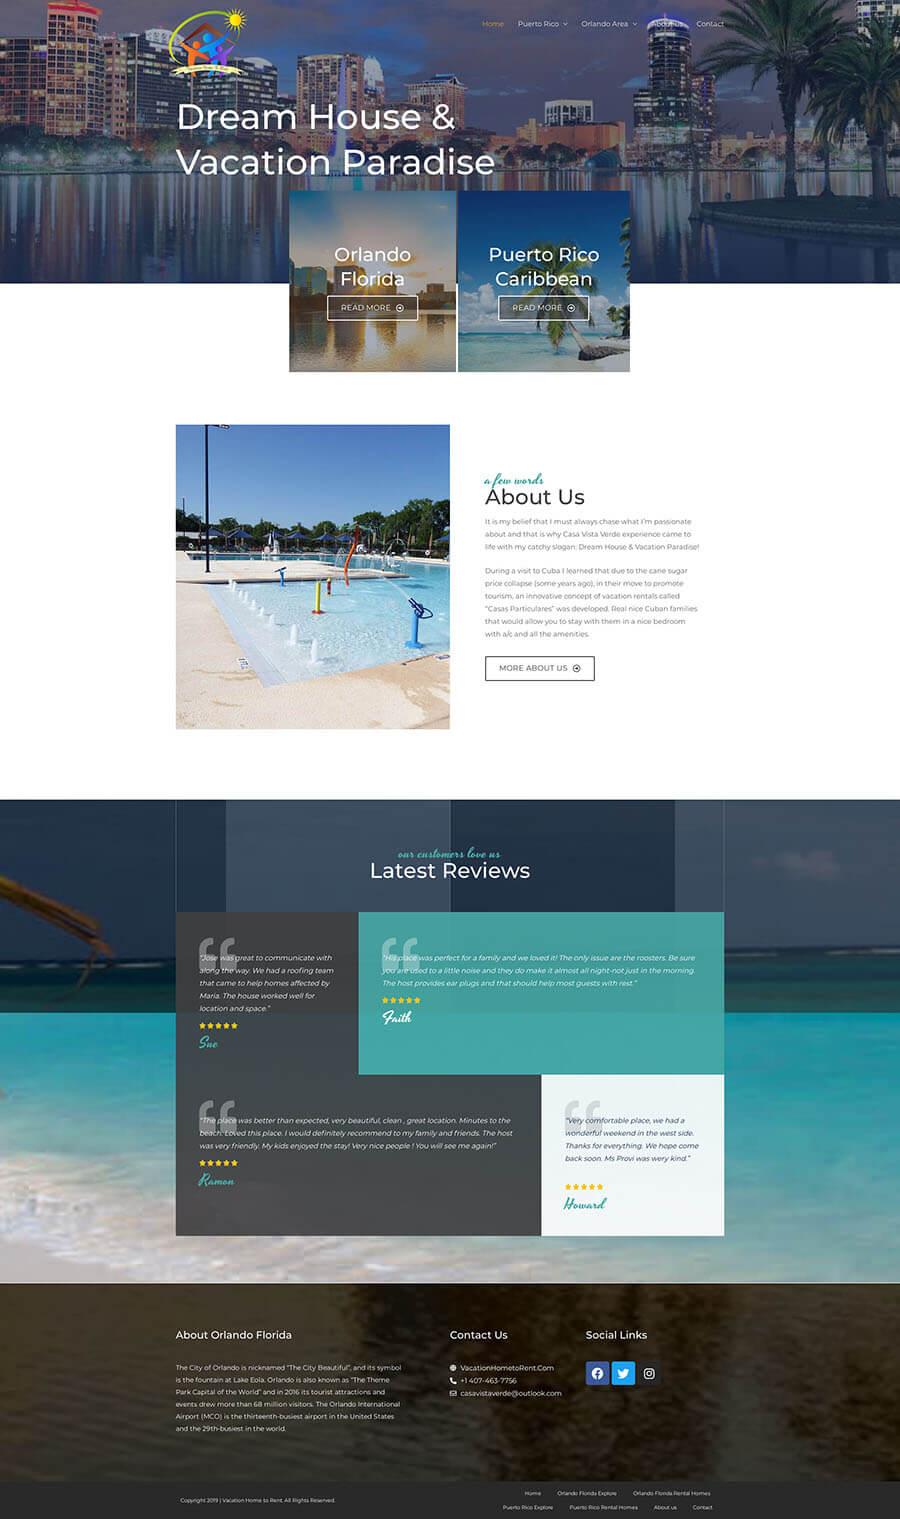 vacationhometorent.com